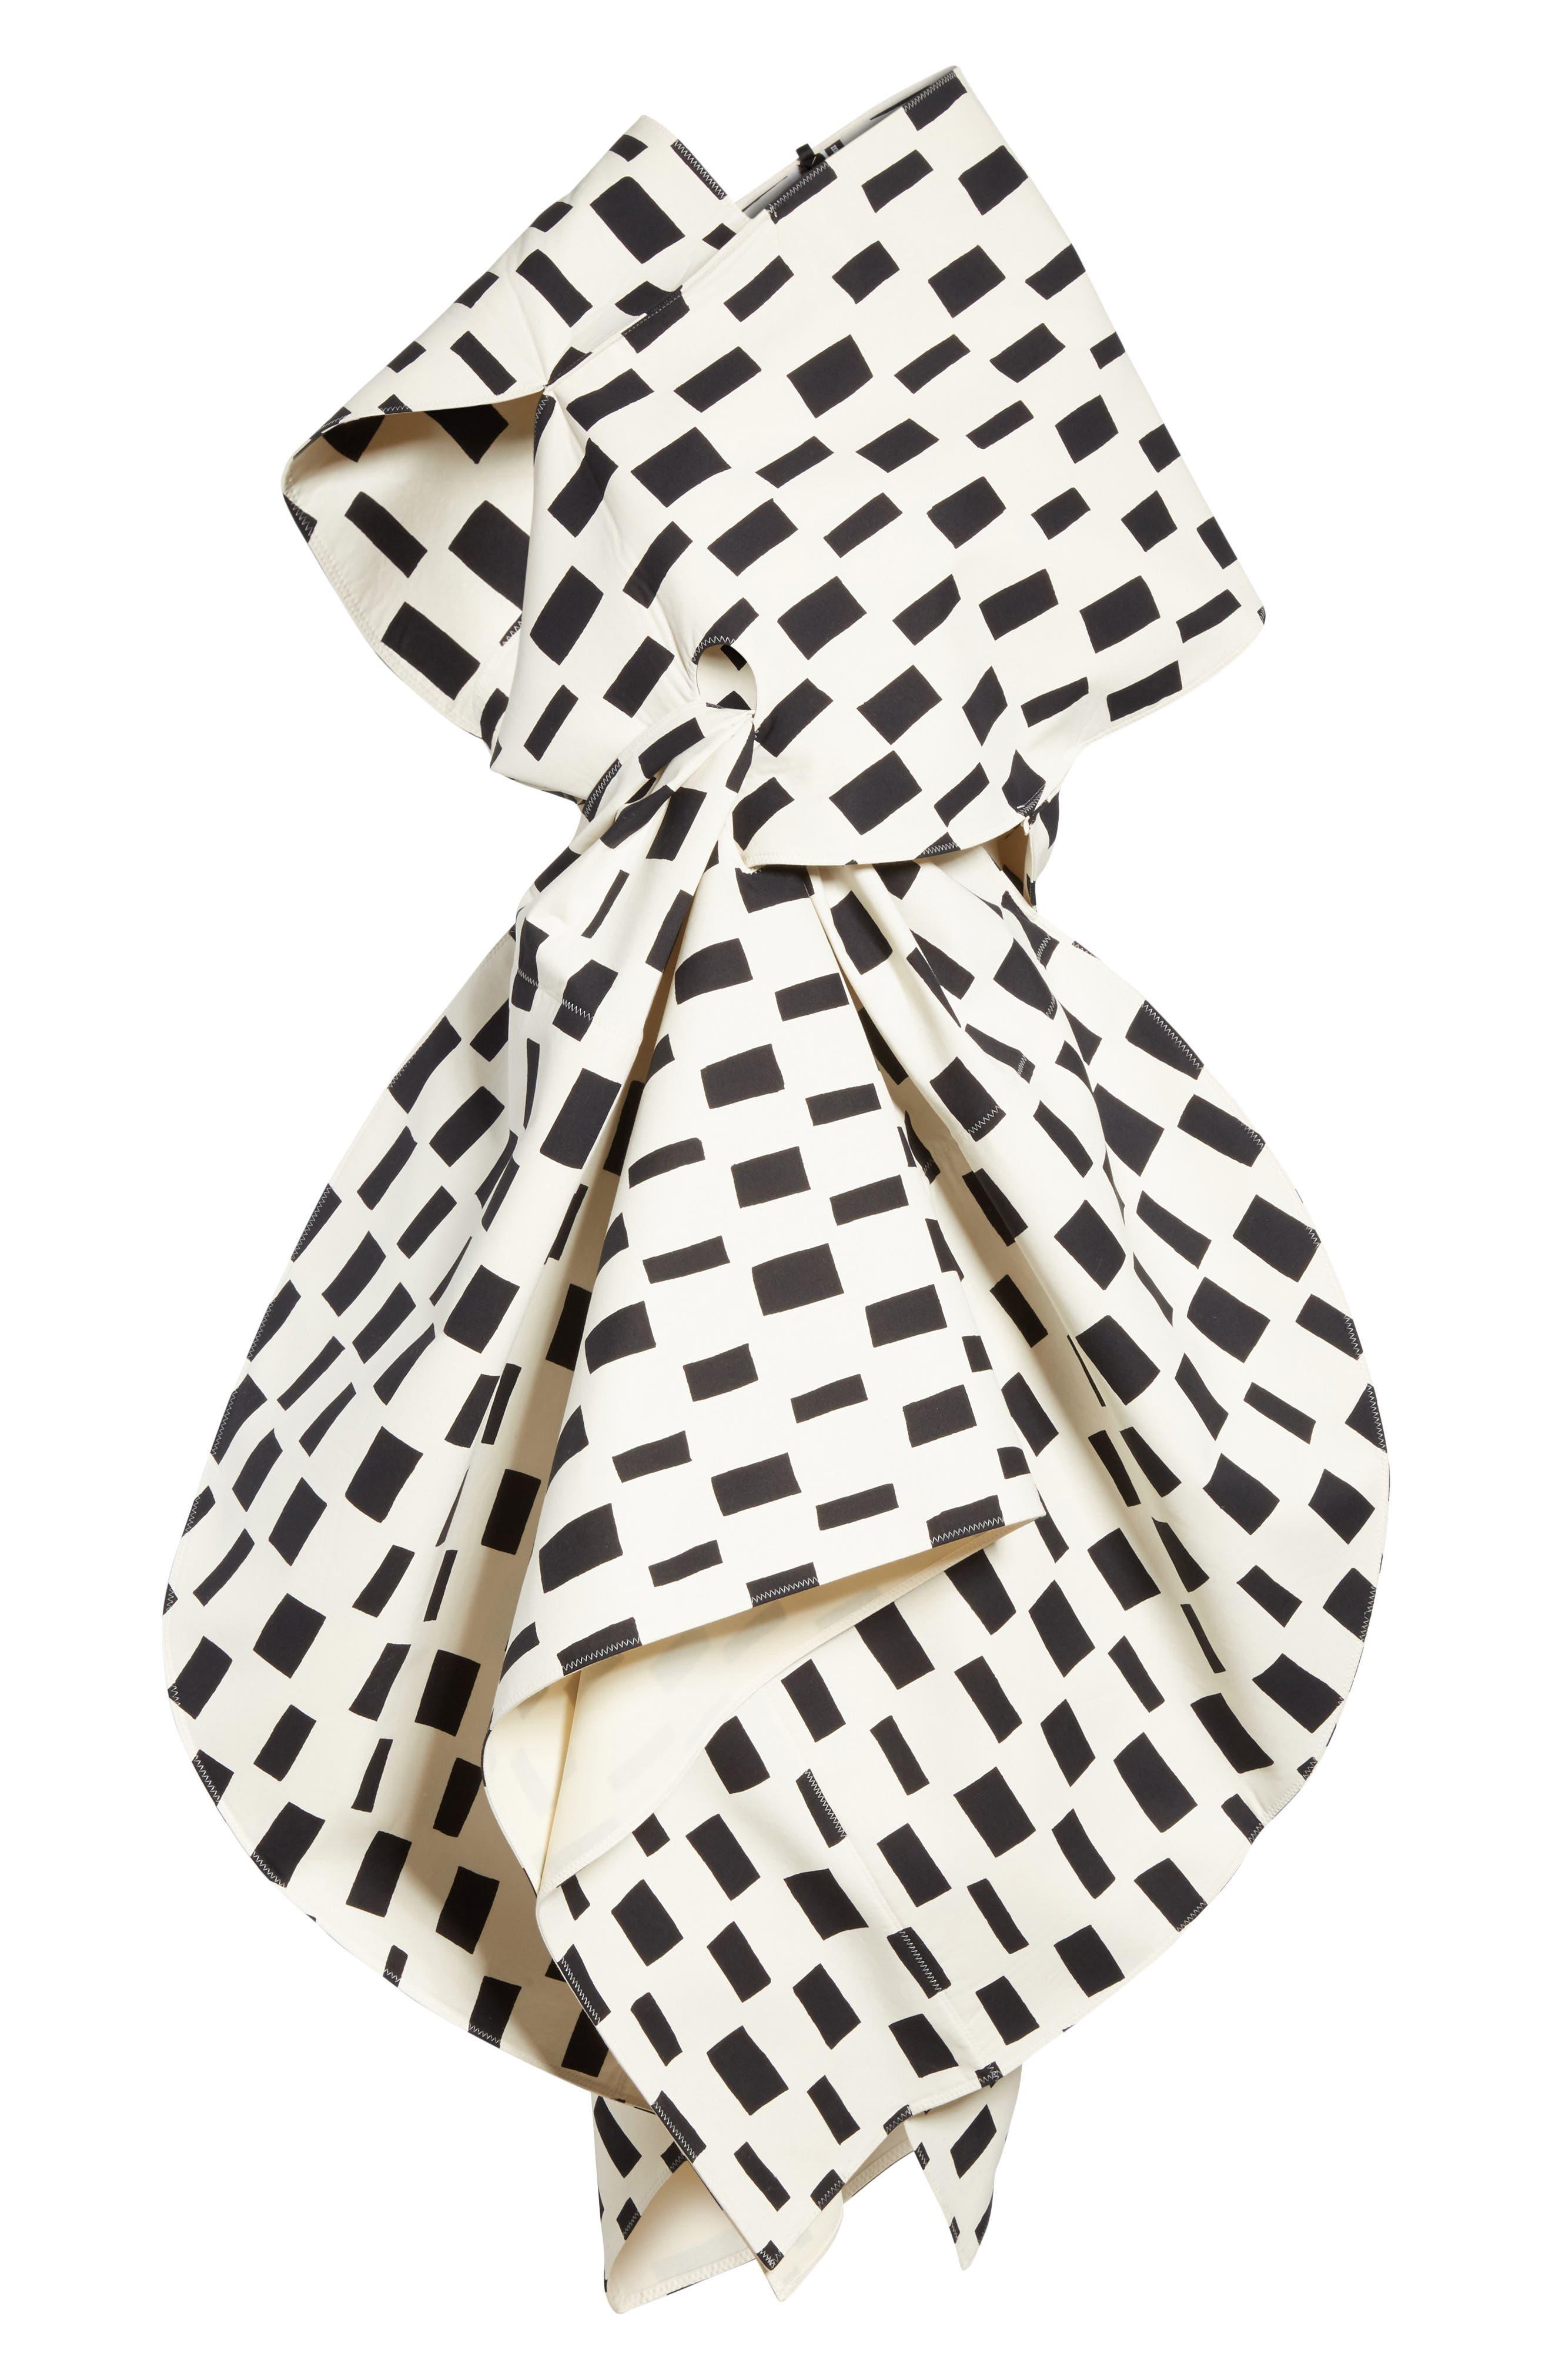 Interweave Geo Print Dress,                             Alternate thumbnail 7, color,                             Off White/ Black